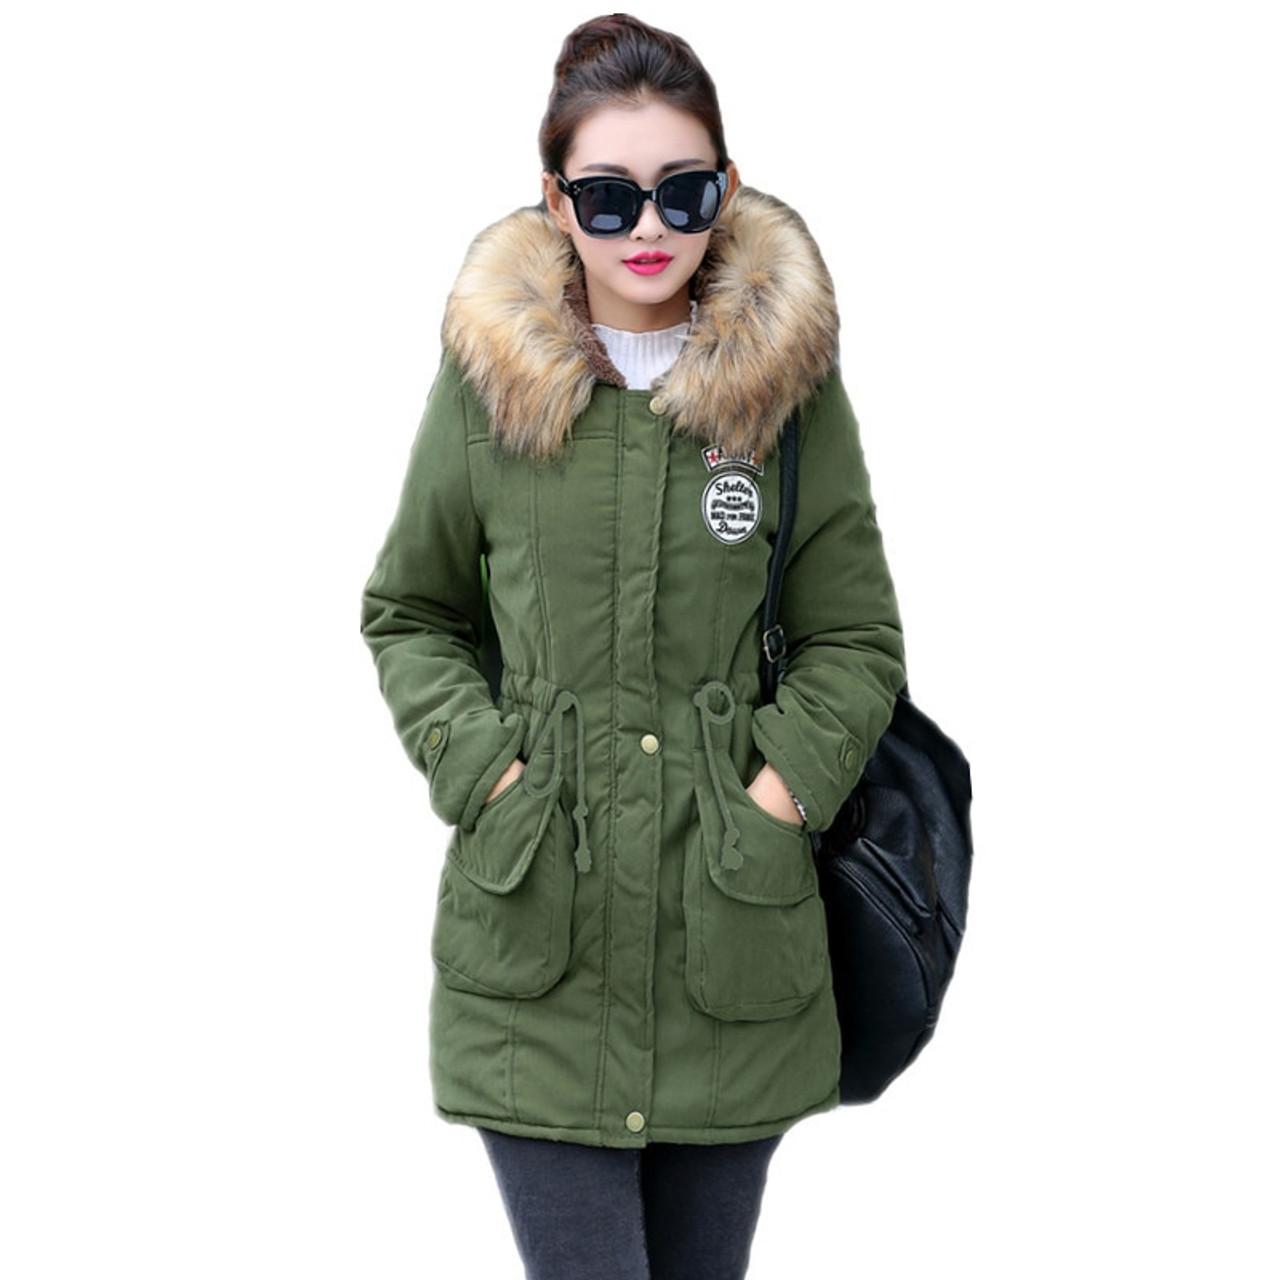 3f3b5c4135a New Long Parkas Female Womens Winter Jacket Coat Thick Cotton Warm Jacket  Womens Outwear Parkas Plus ...